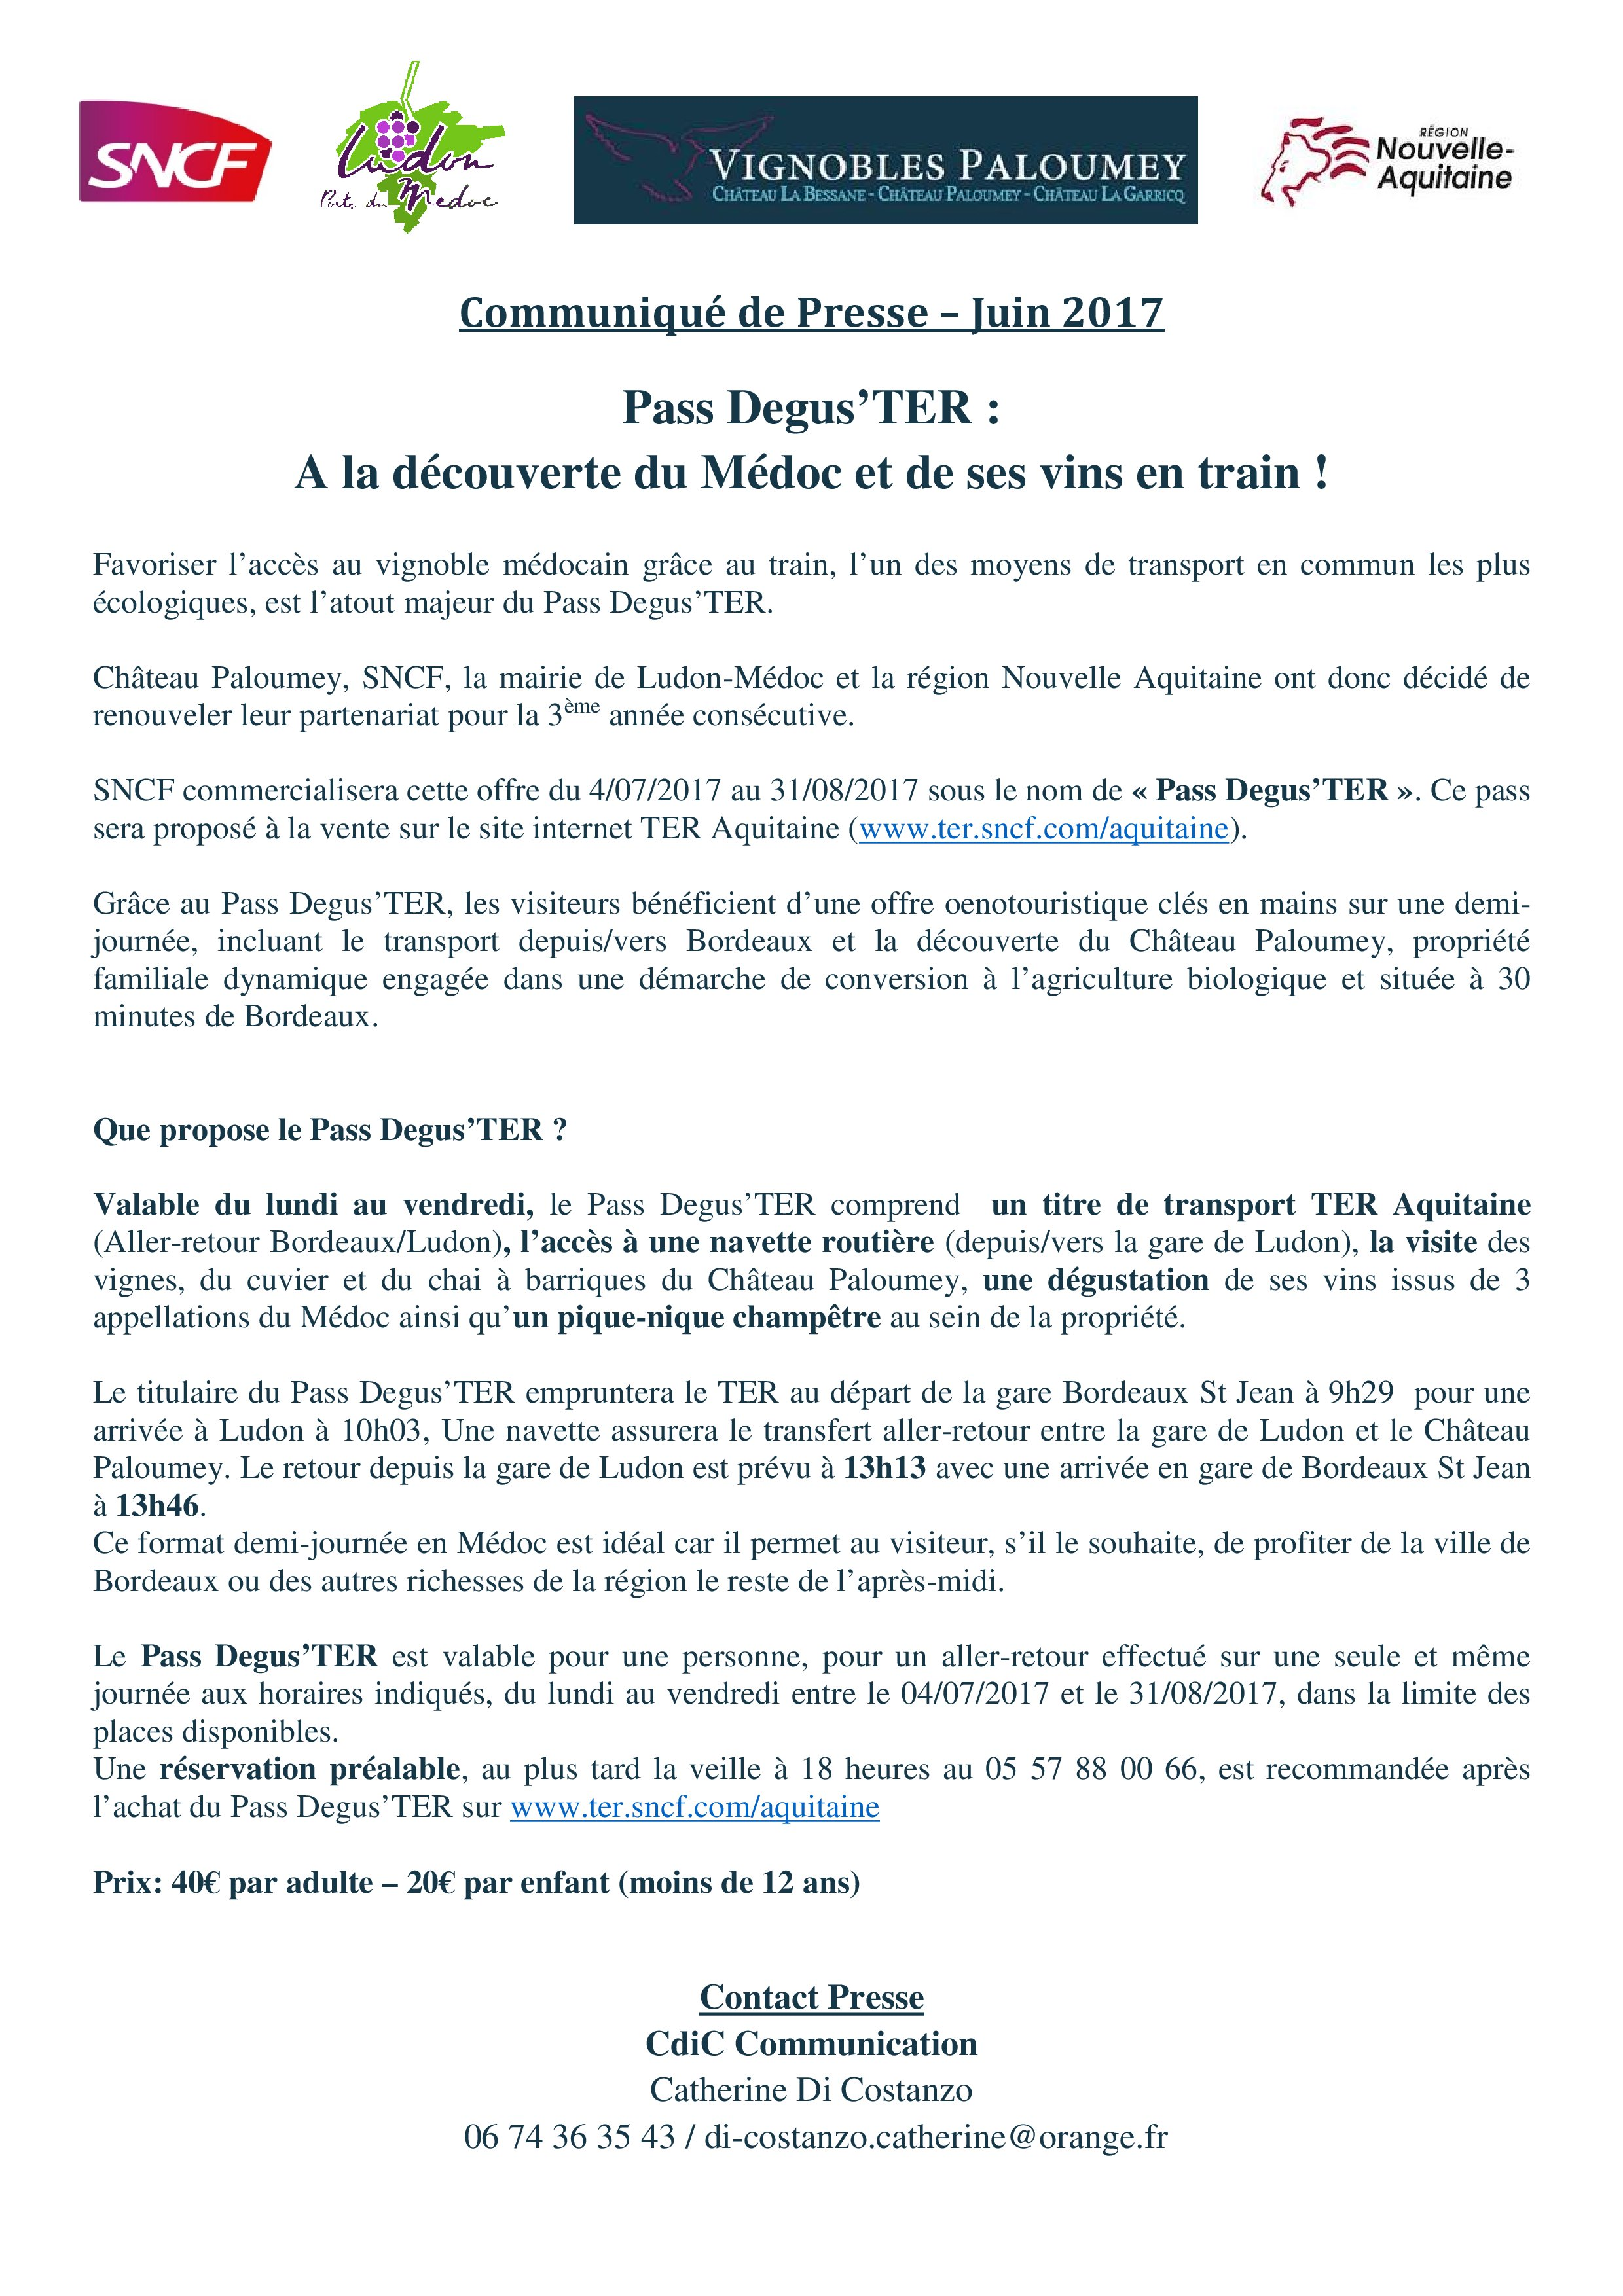 Communique_ de Presse Pass Degus'TER 16 juin 2017